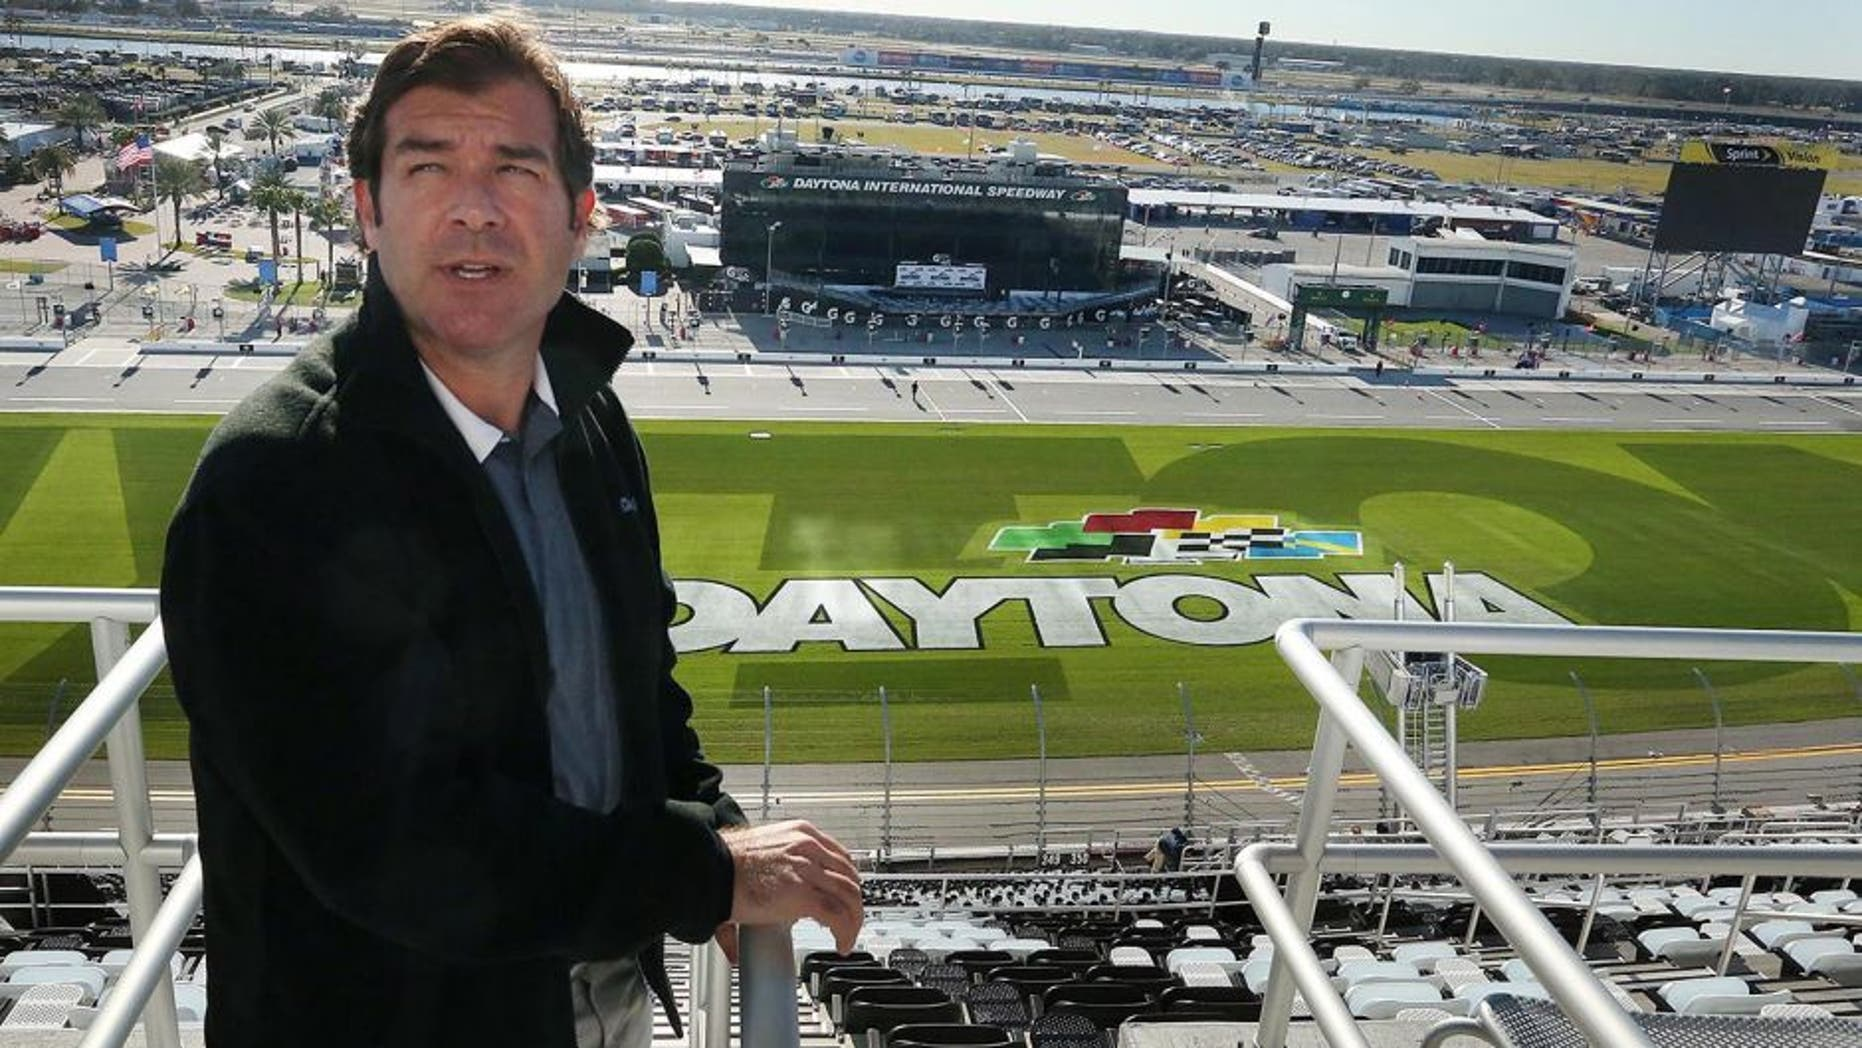 Joie Chitwood III, President of Daytona International Speedway Motorsports Stadium, gives an exclusive tour of the impressive new stadium facilities on Friday, Feb. 12, 2016 in Daytona Beach, Fla. (Stephen M. Dowell/Orlando Sentinel/TNS via Getty Images)